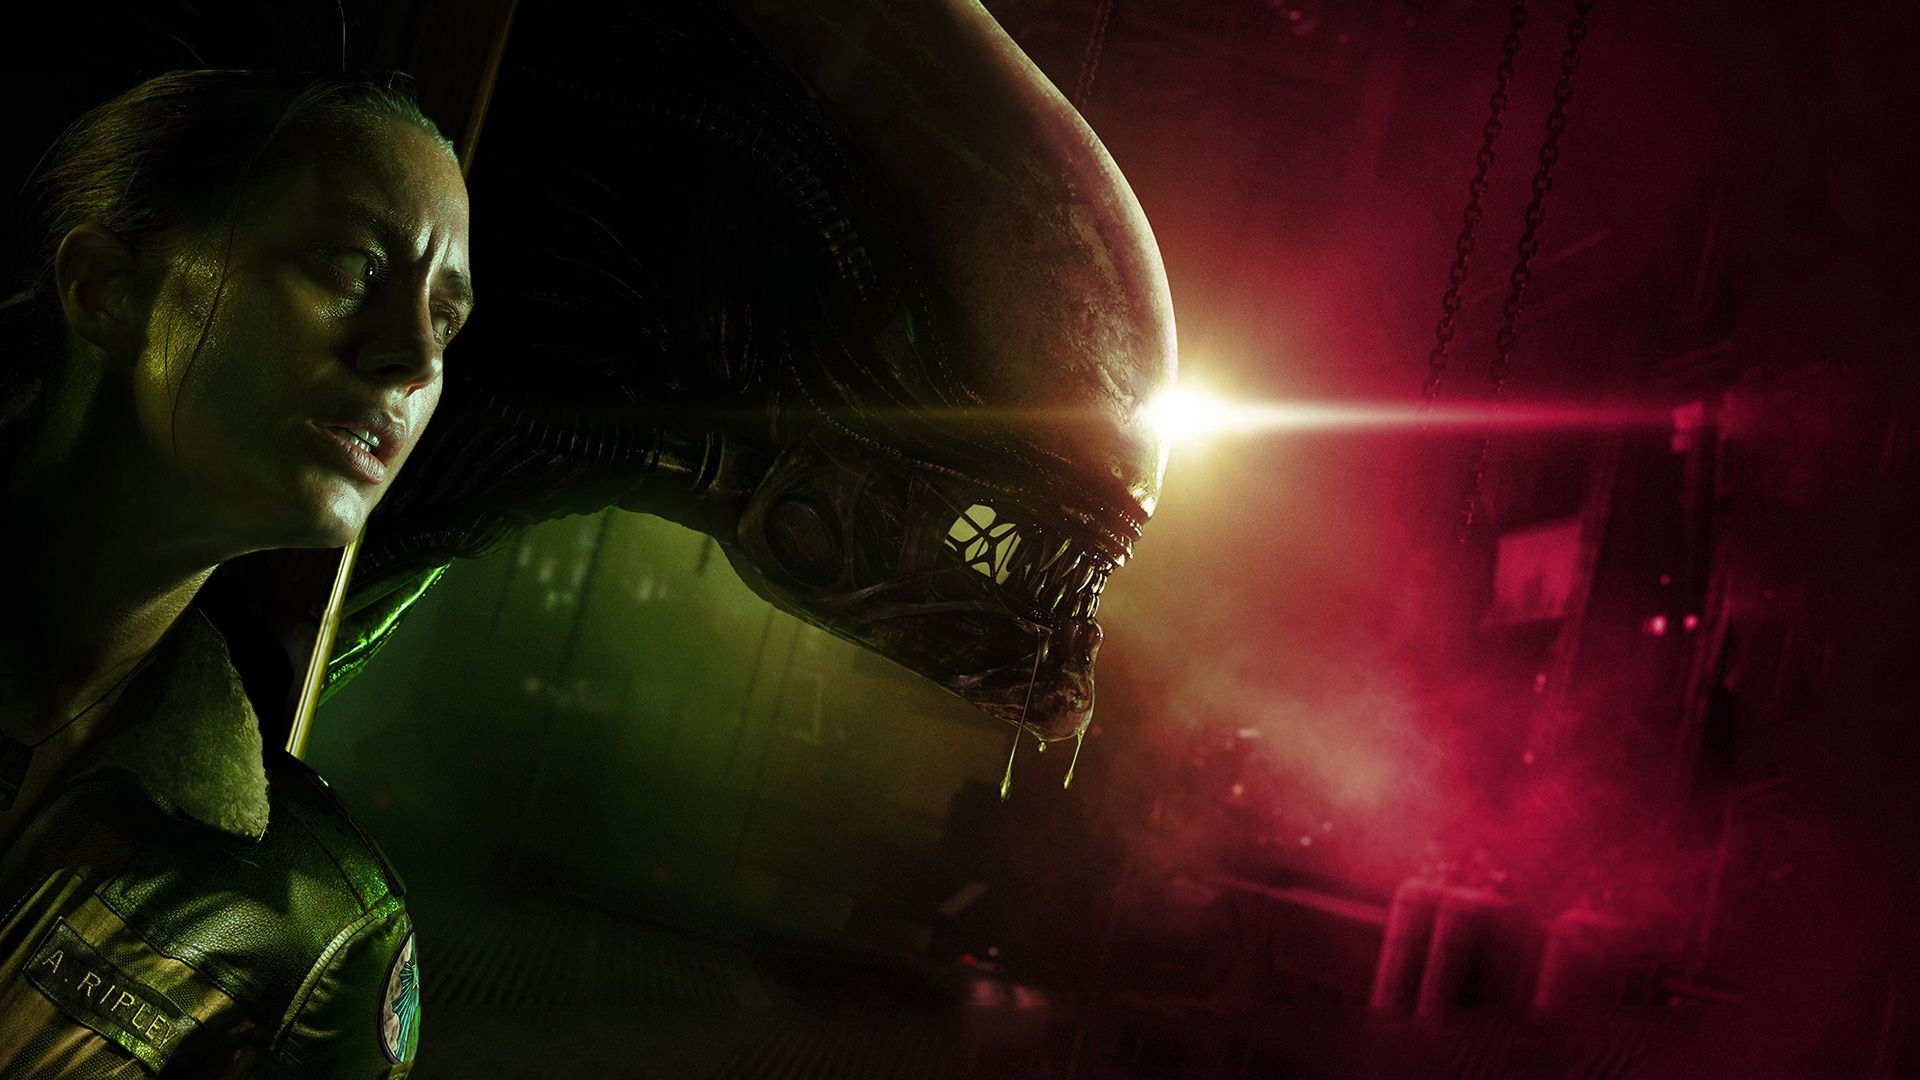 Alien abuse naked videos